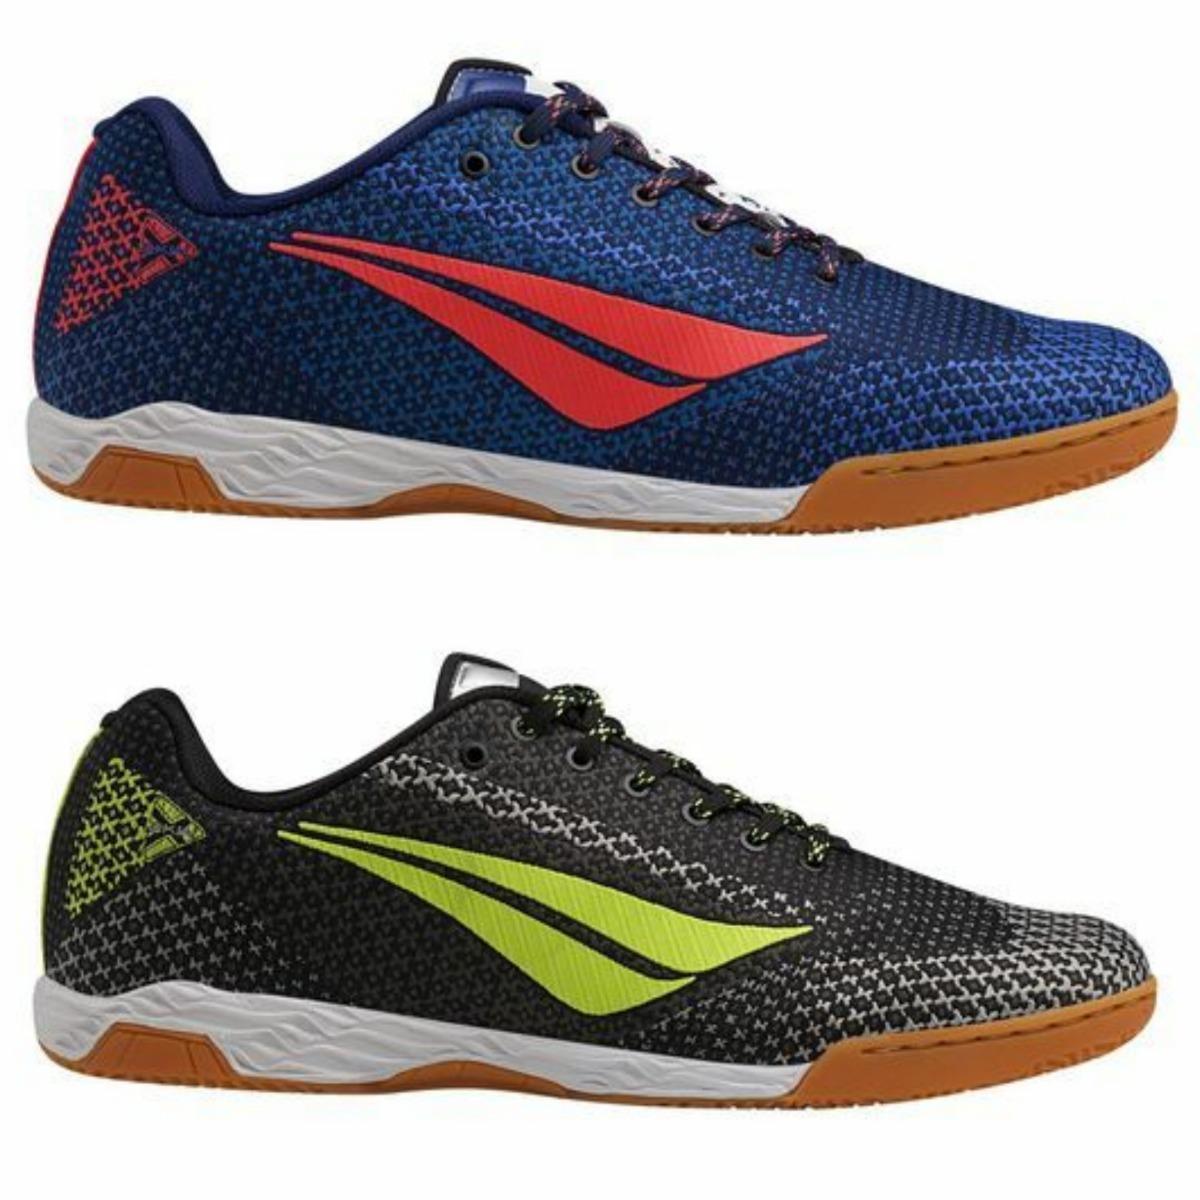 4b04f2d02c6ed tenis futsal penalty max 500 - eosnit. Carregando zoom.